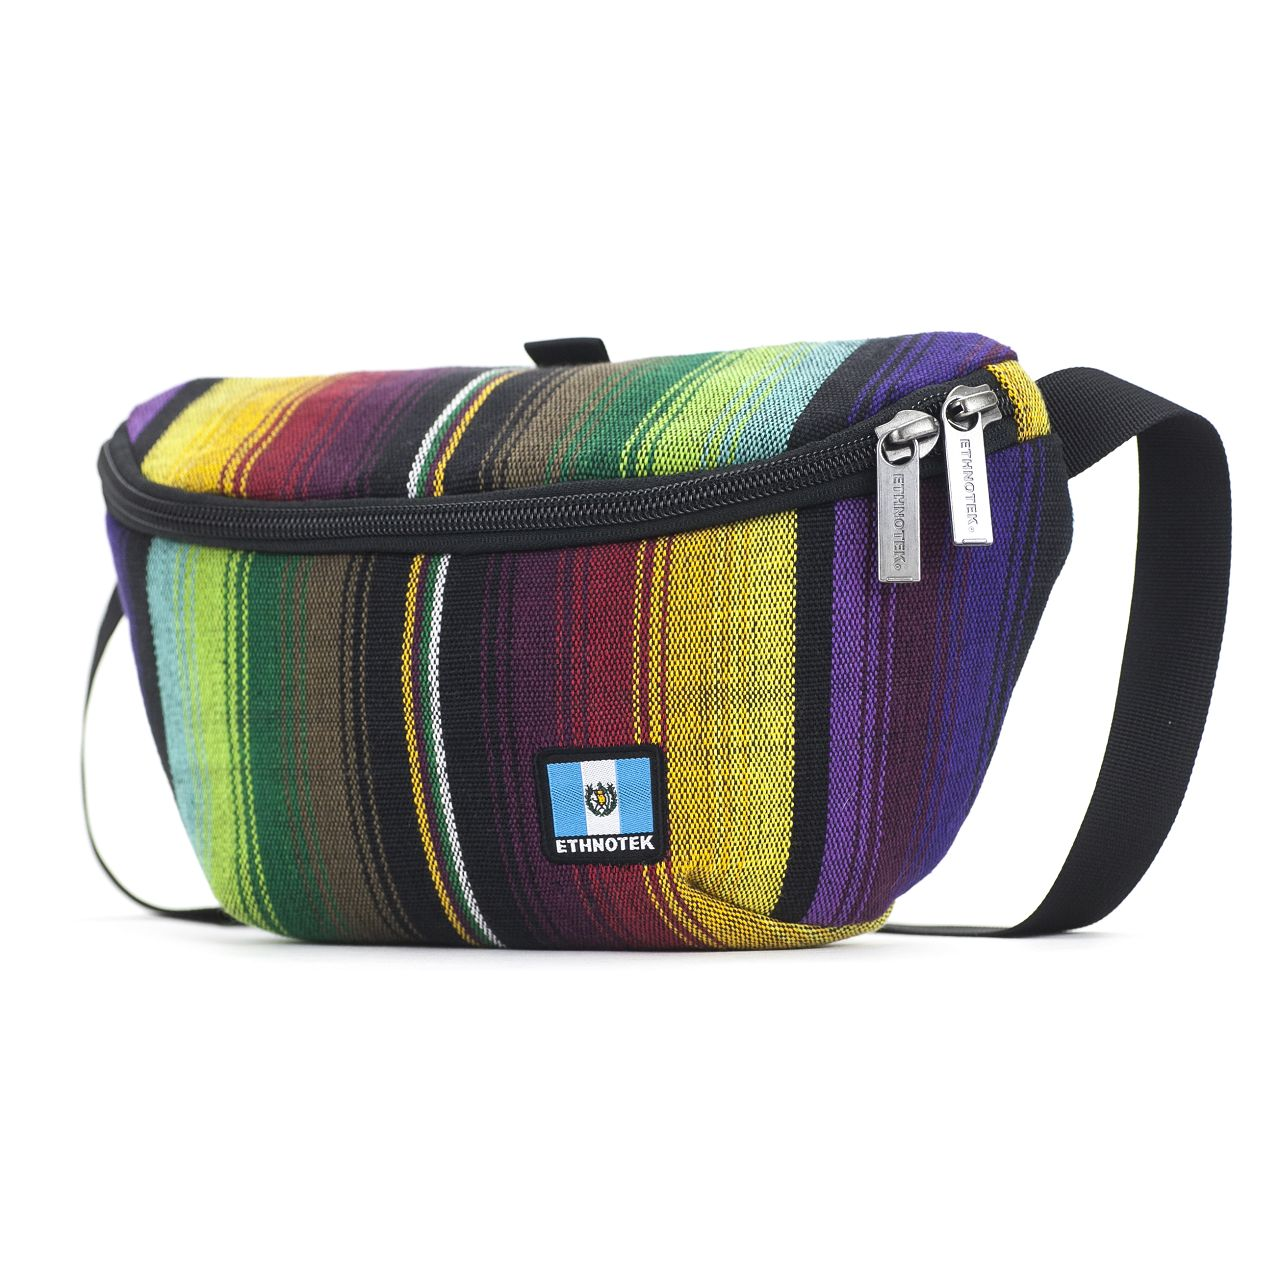 Ethnotek Bagus Bum Bag S Guatemala 1